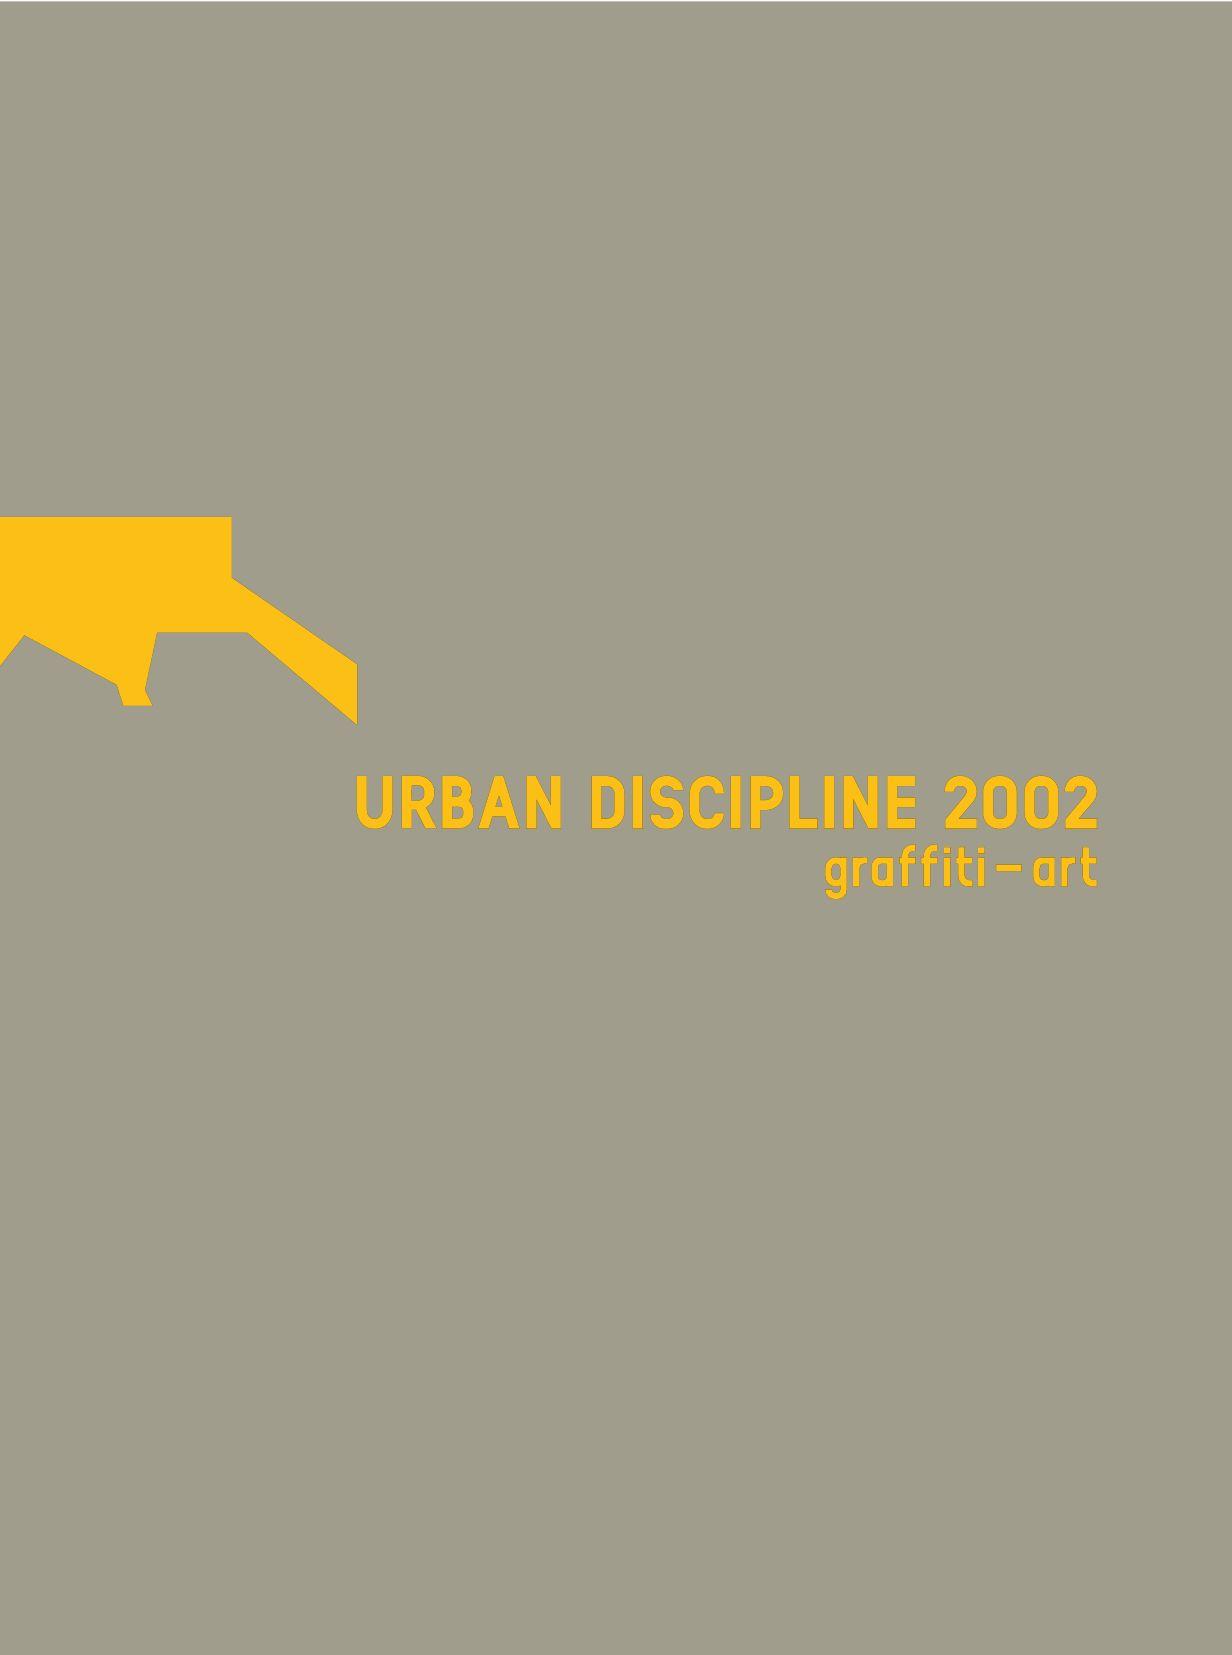 Urban Discipline 2002 by getting up   issuu 1232x1655